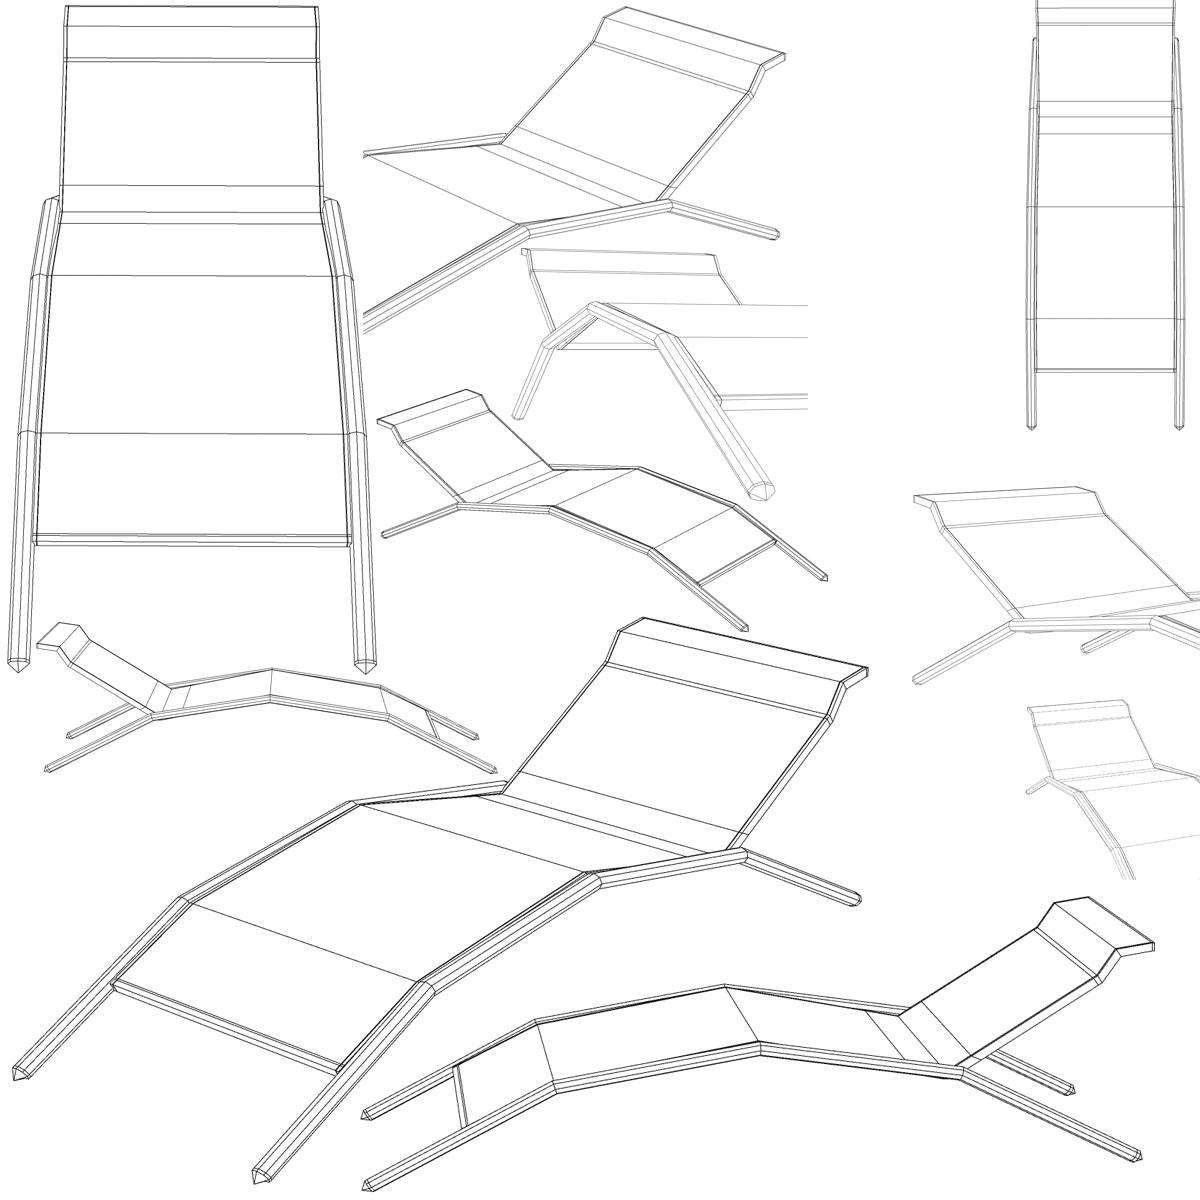 sunbed chair 3d model 3ds max fbx c4d ma mb obj 162652